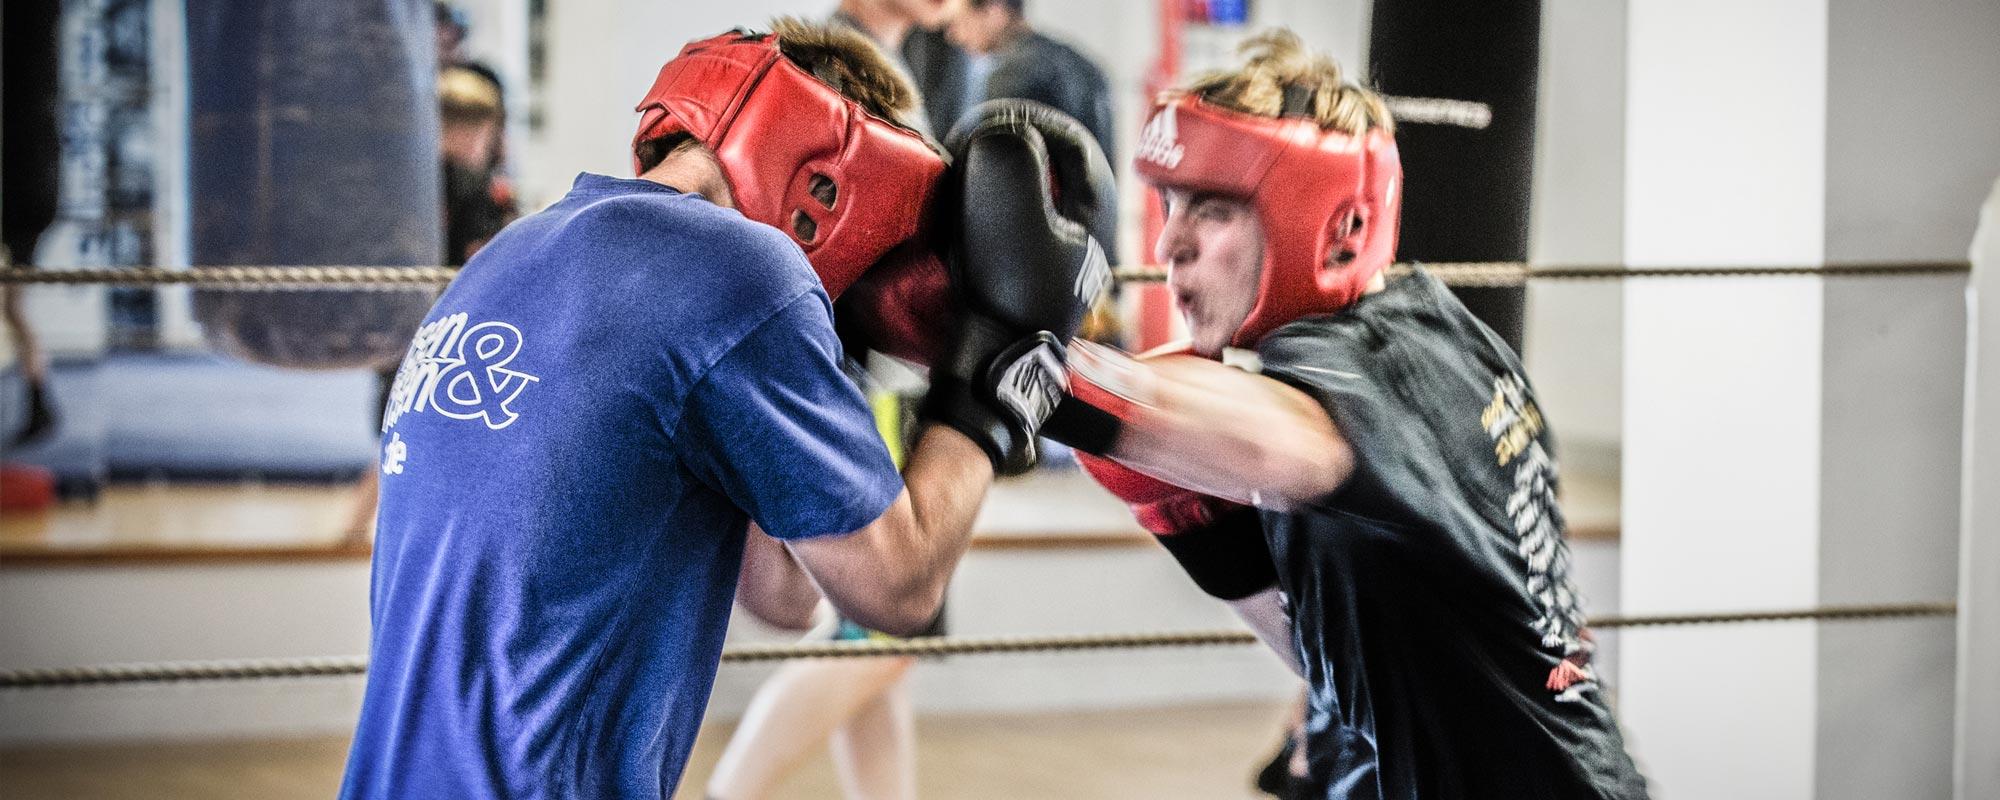 bokseclub-foto6